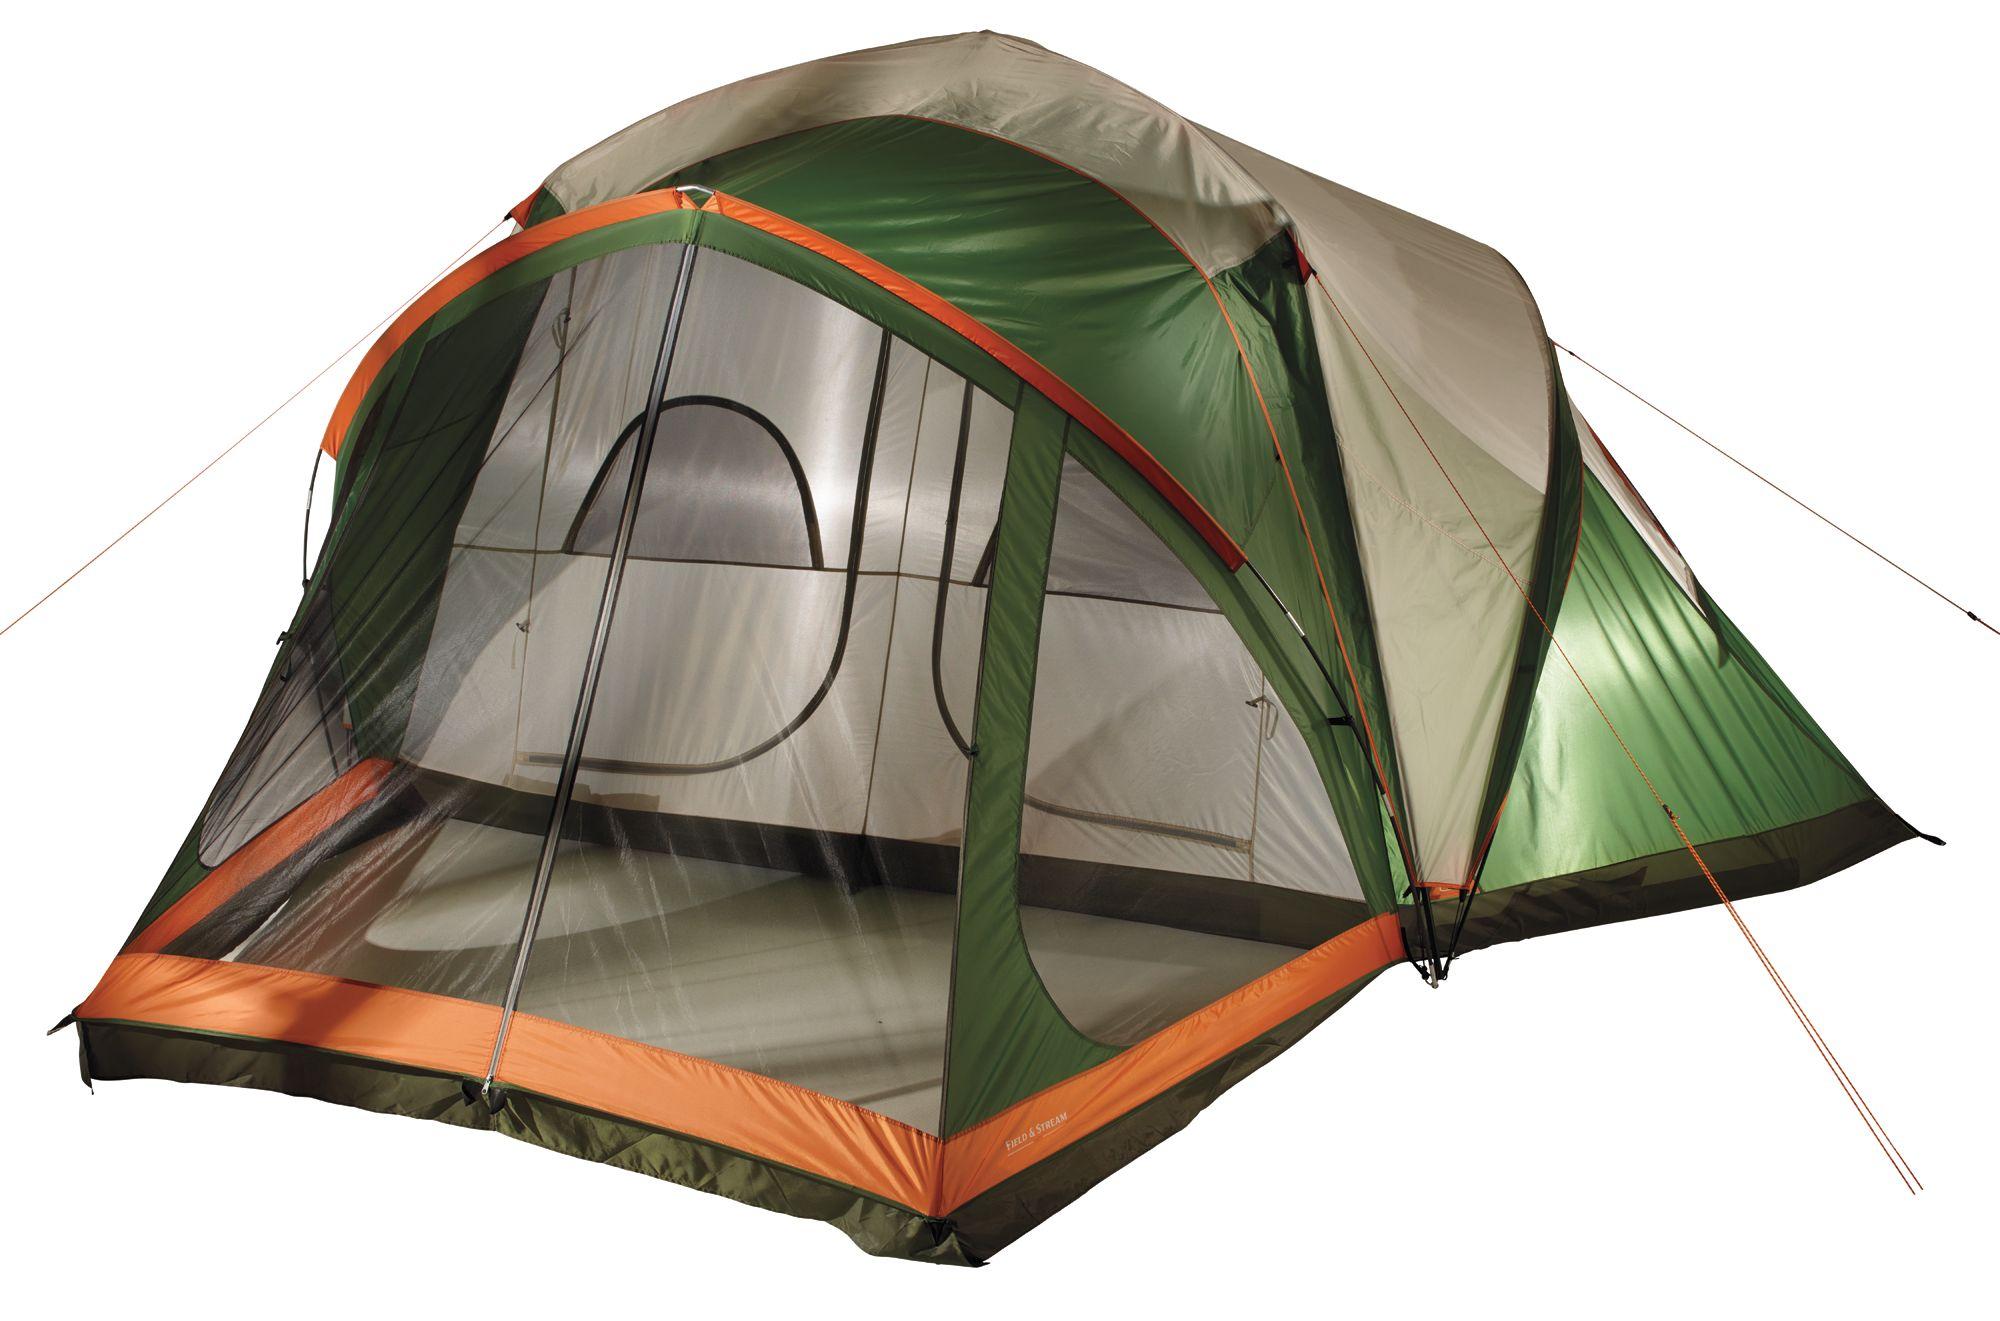 Field u0026 Stream Forest Ridge 8 Person Family Tent  sc 1 st  Field u0026 Stream & Field u0026 Stream Forest Ridge 8 Person Family Tent | Field u0026 Stream